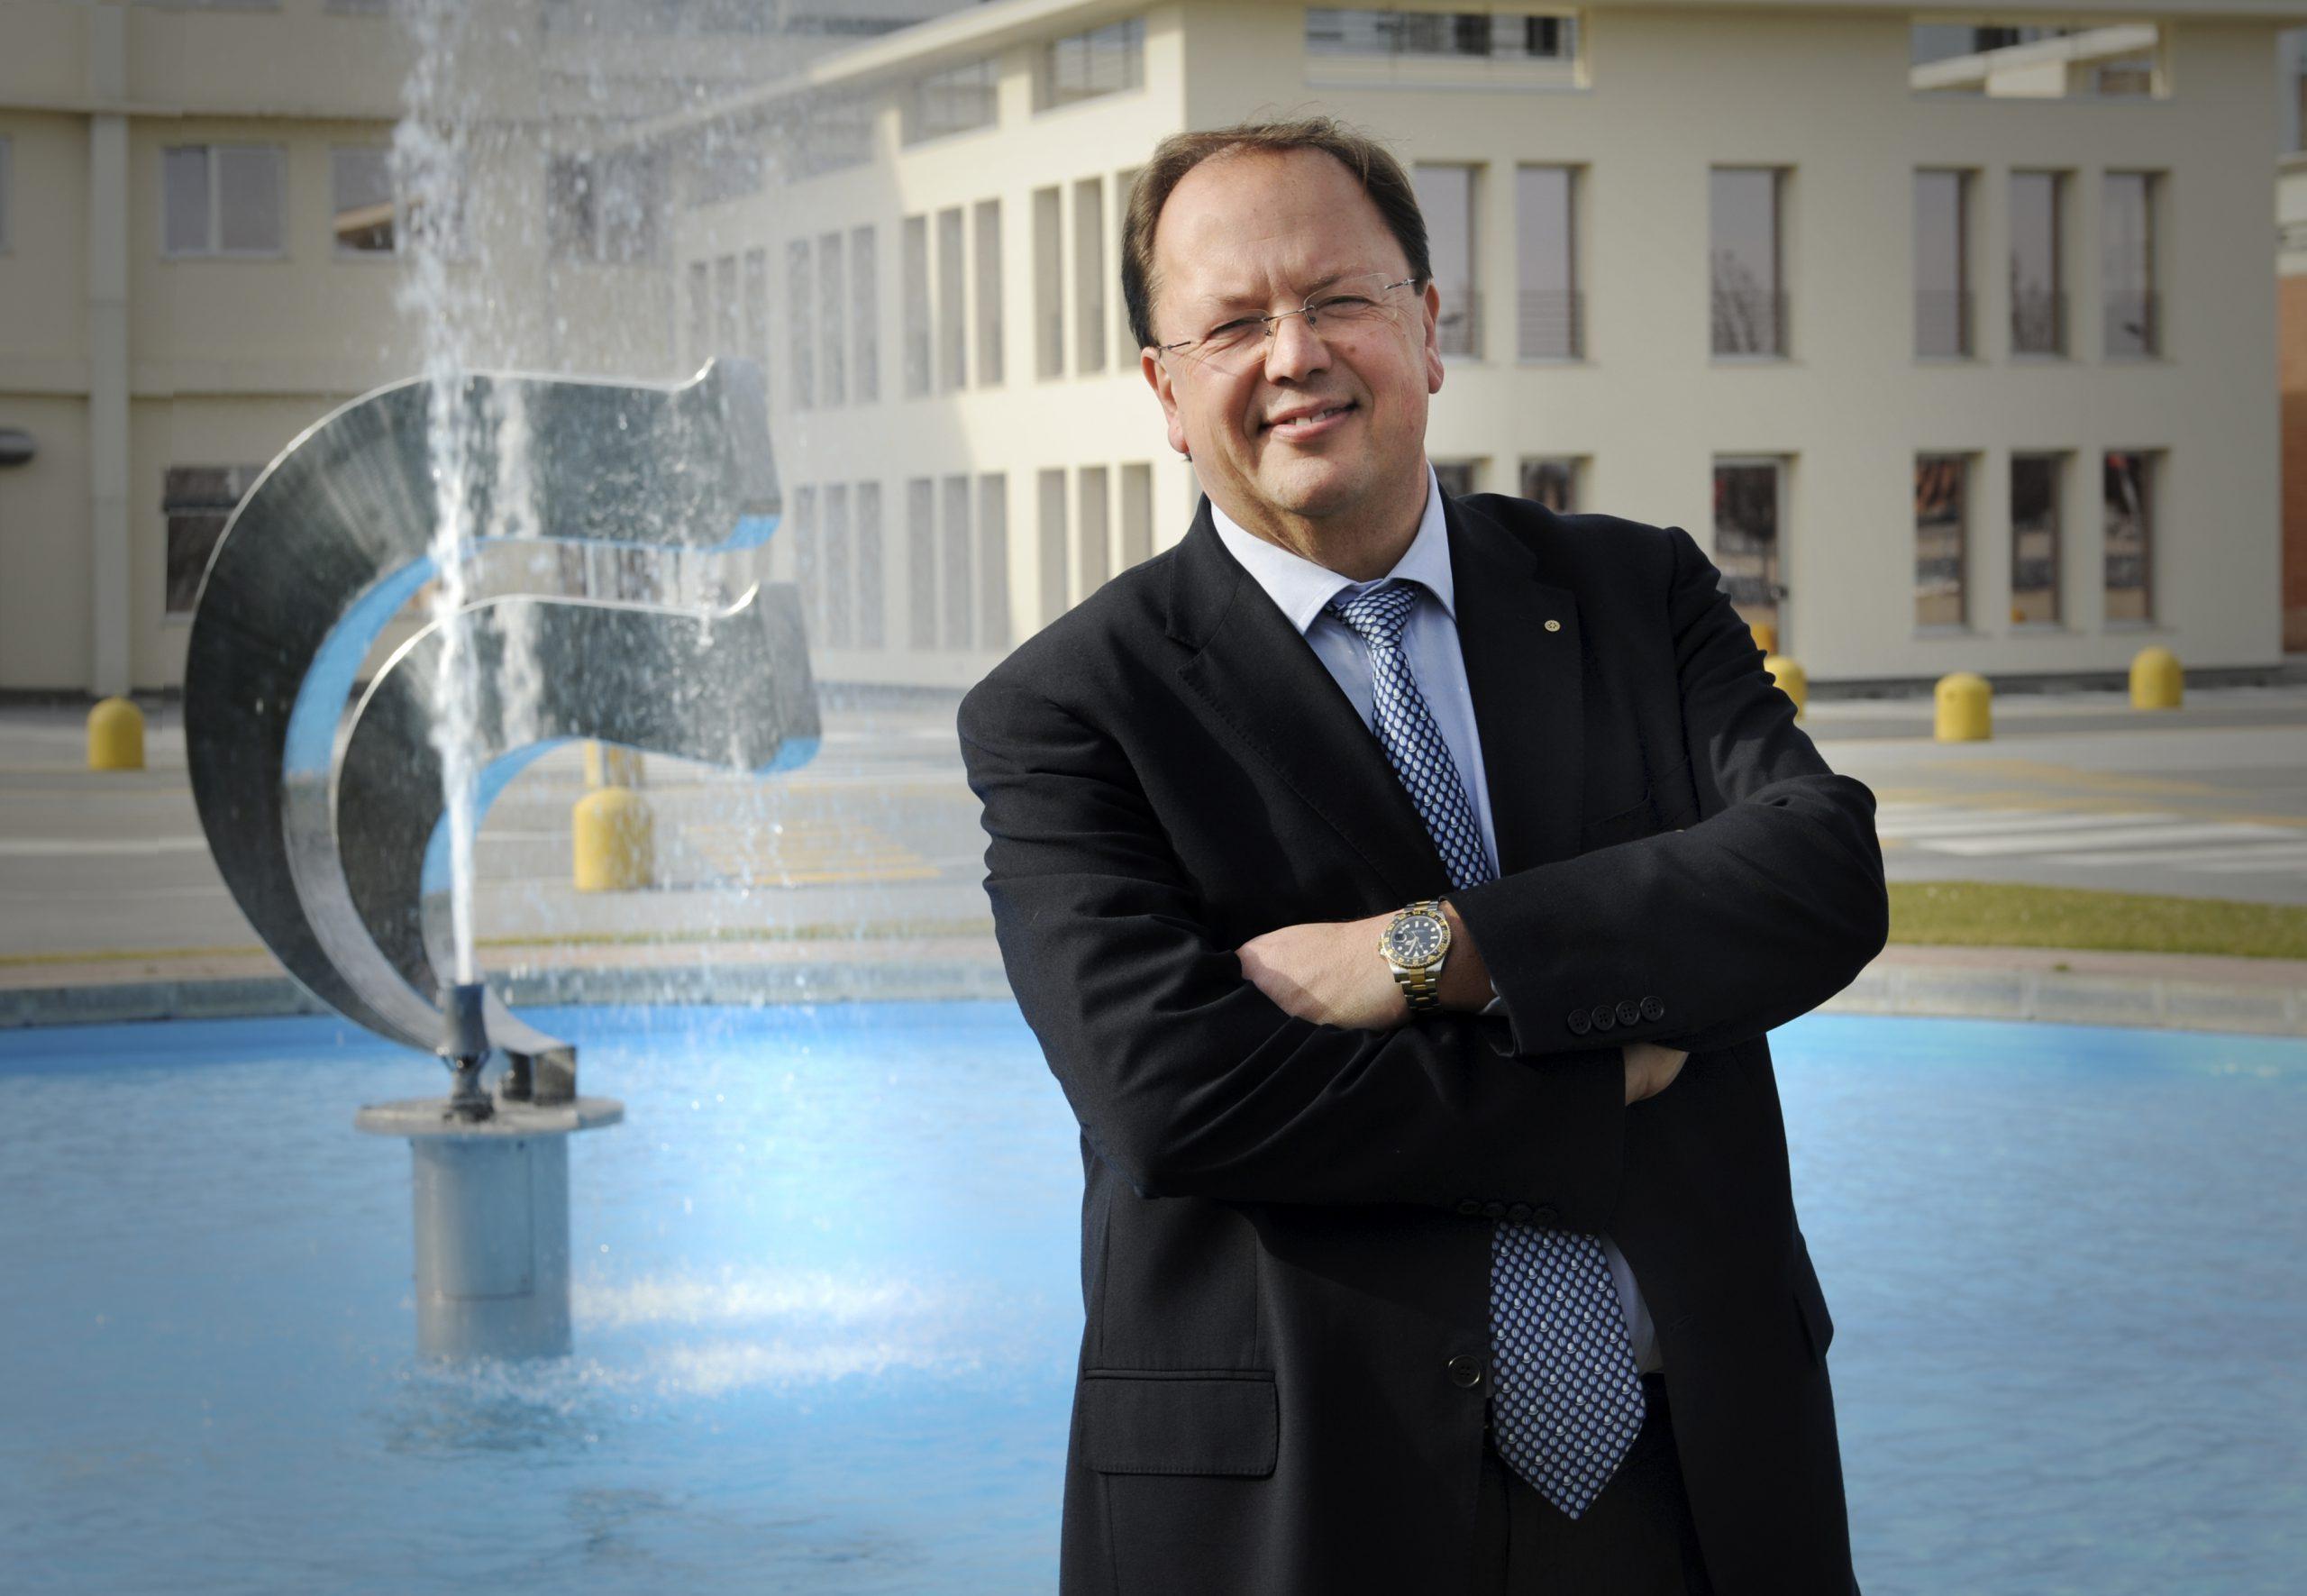 Luigi Lazzareschi, CEO Sofidel Group